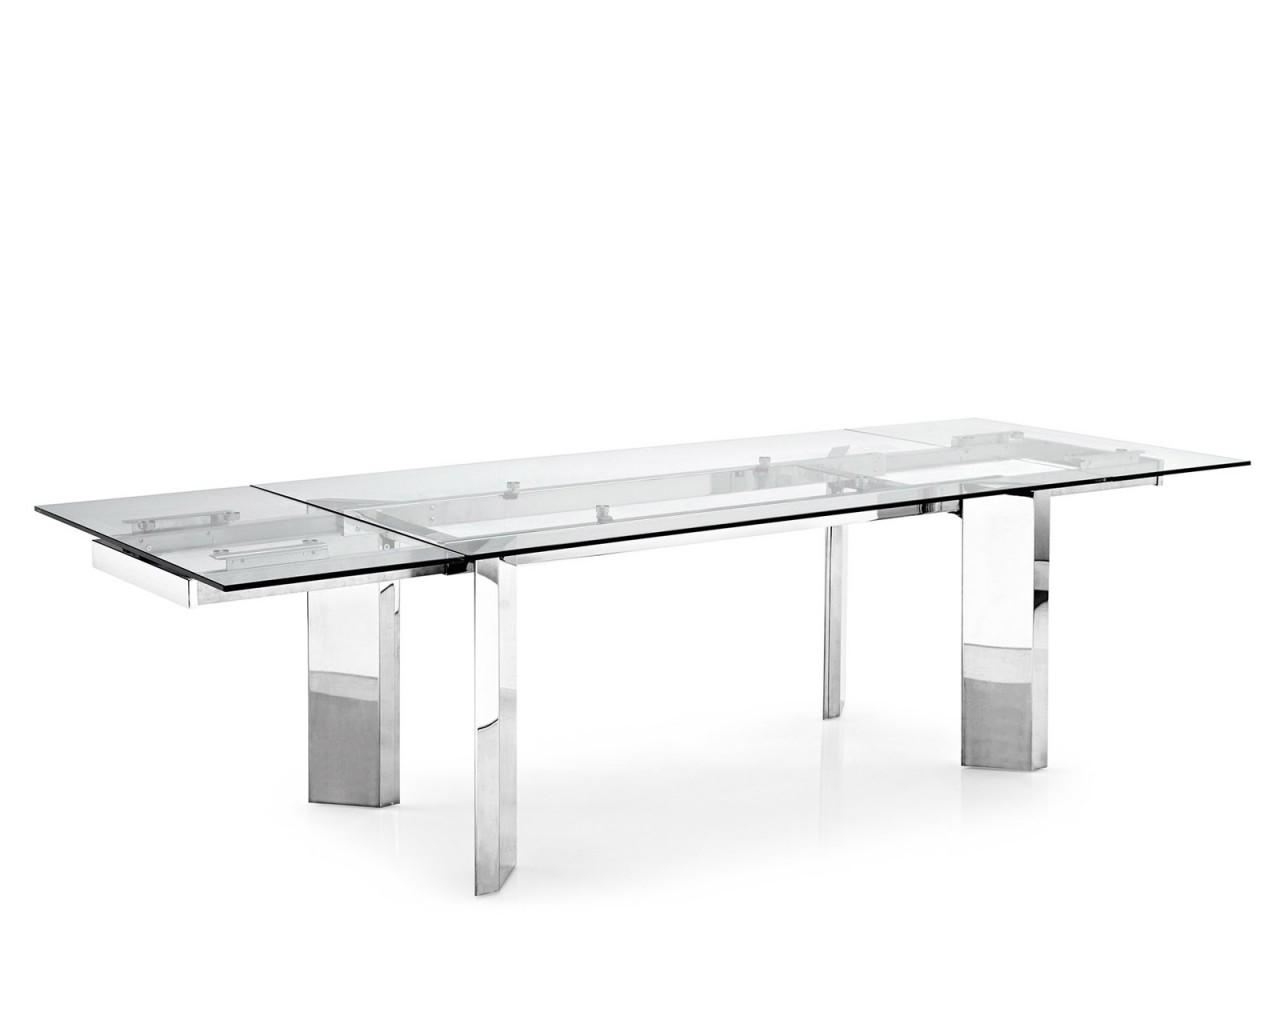 Tower tavolo allungabile tavoli torino calligaris for Tavolo vetro bianco calligaris